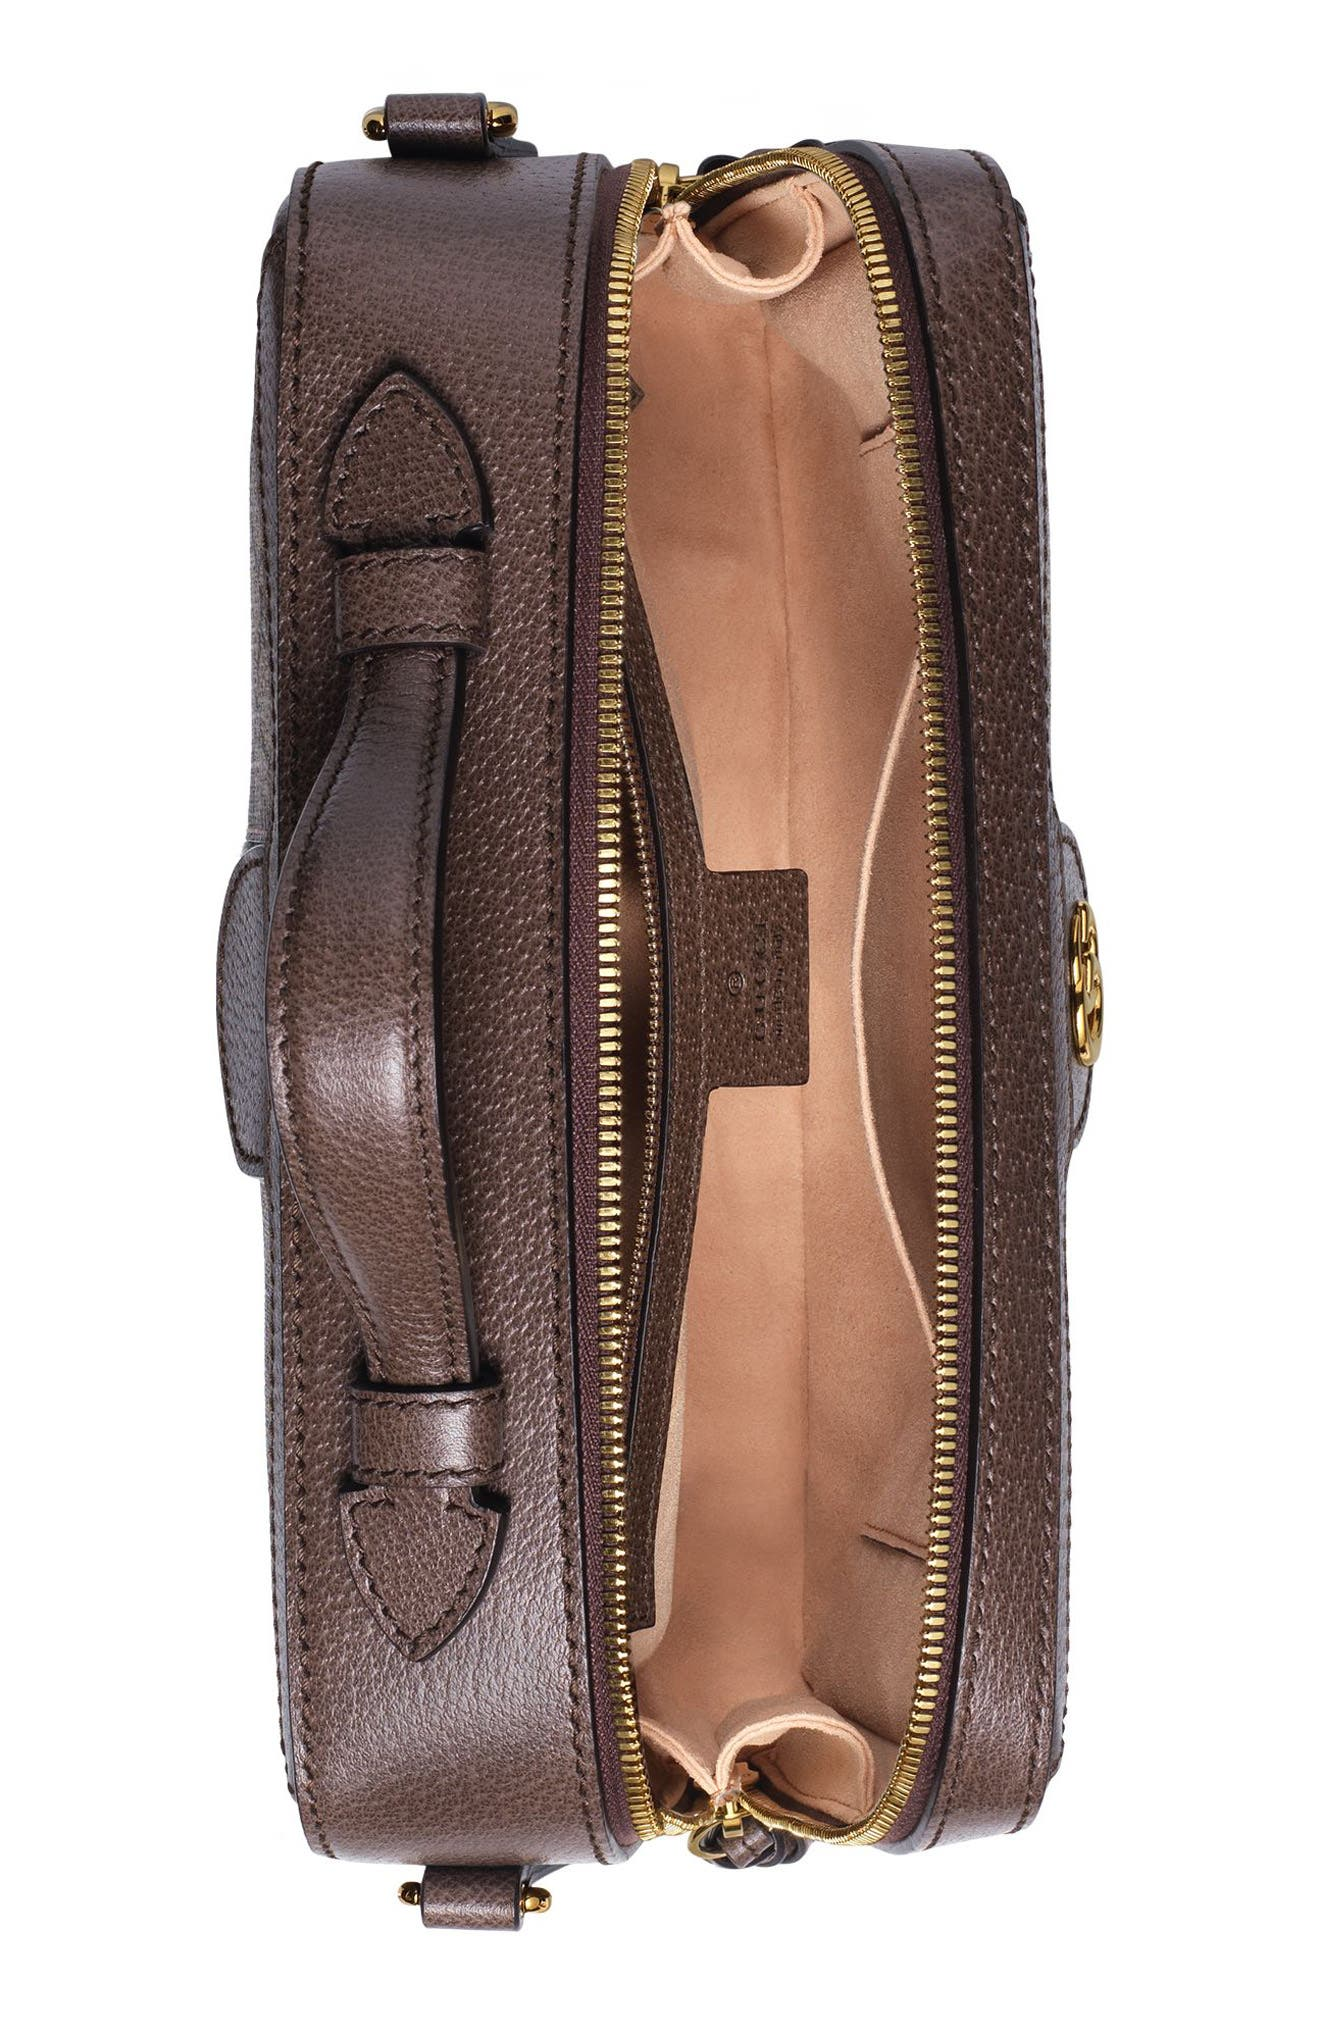 GUCCI, Small Ophidia GG Supreme Canvas Shoulder Bag, Alternate thumbnail 3, color, 250